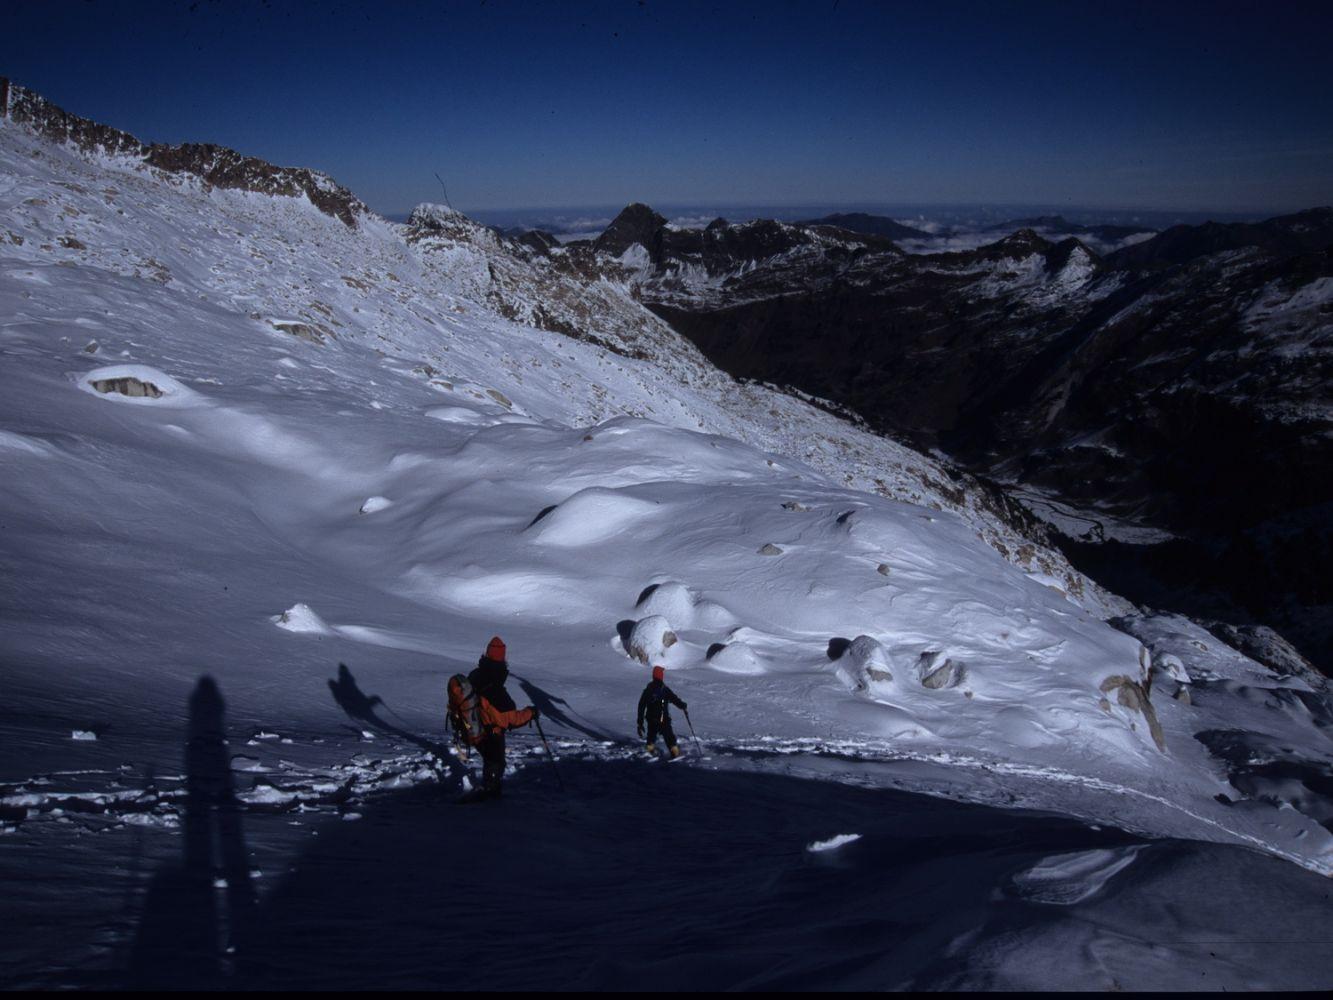 alpinisme_hiver_afdv_23